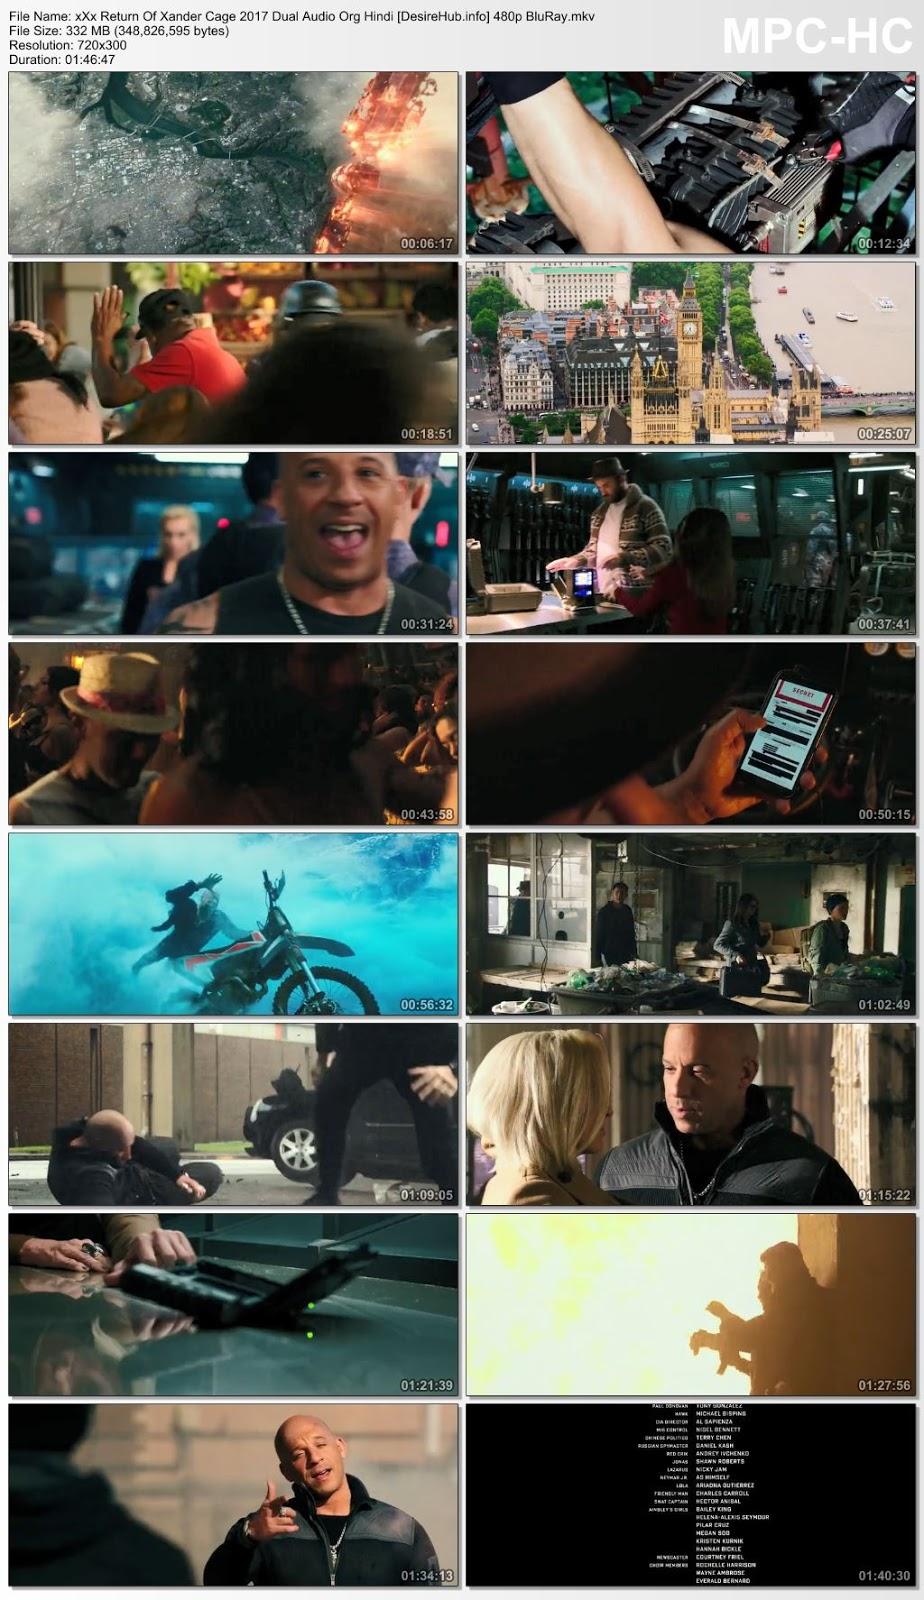 xXx: Return of Xander Cage 2017 Dual Audio Hindi 480p BluRay 300MB Desirehub